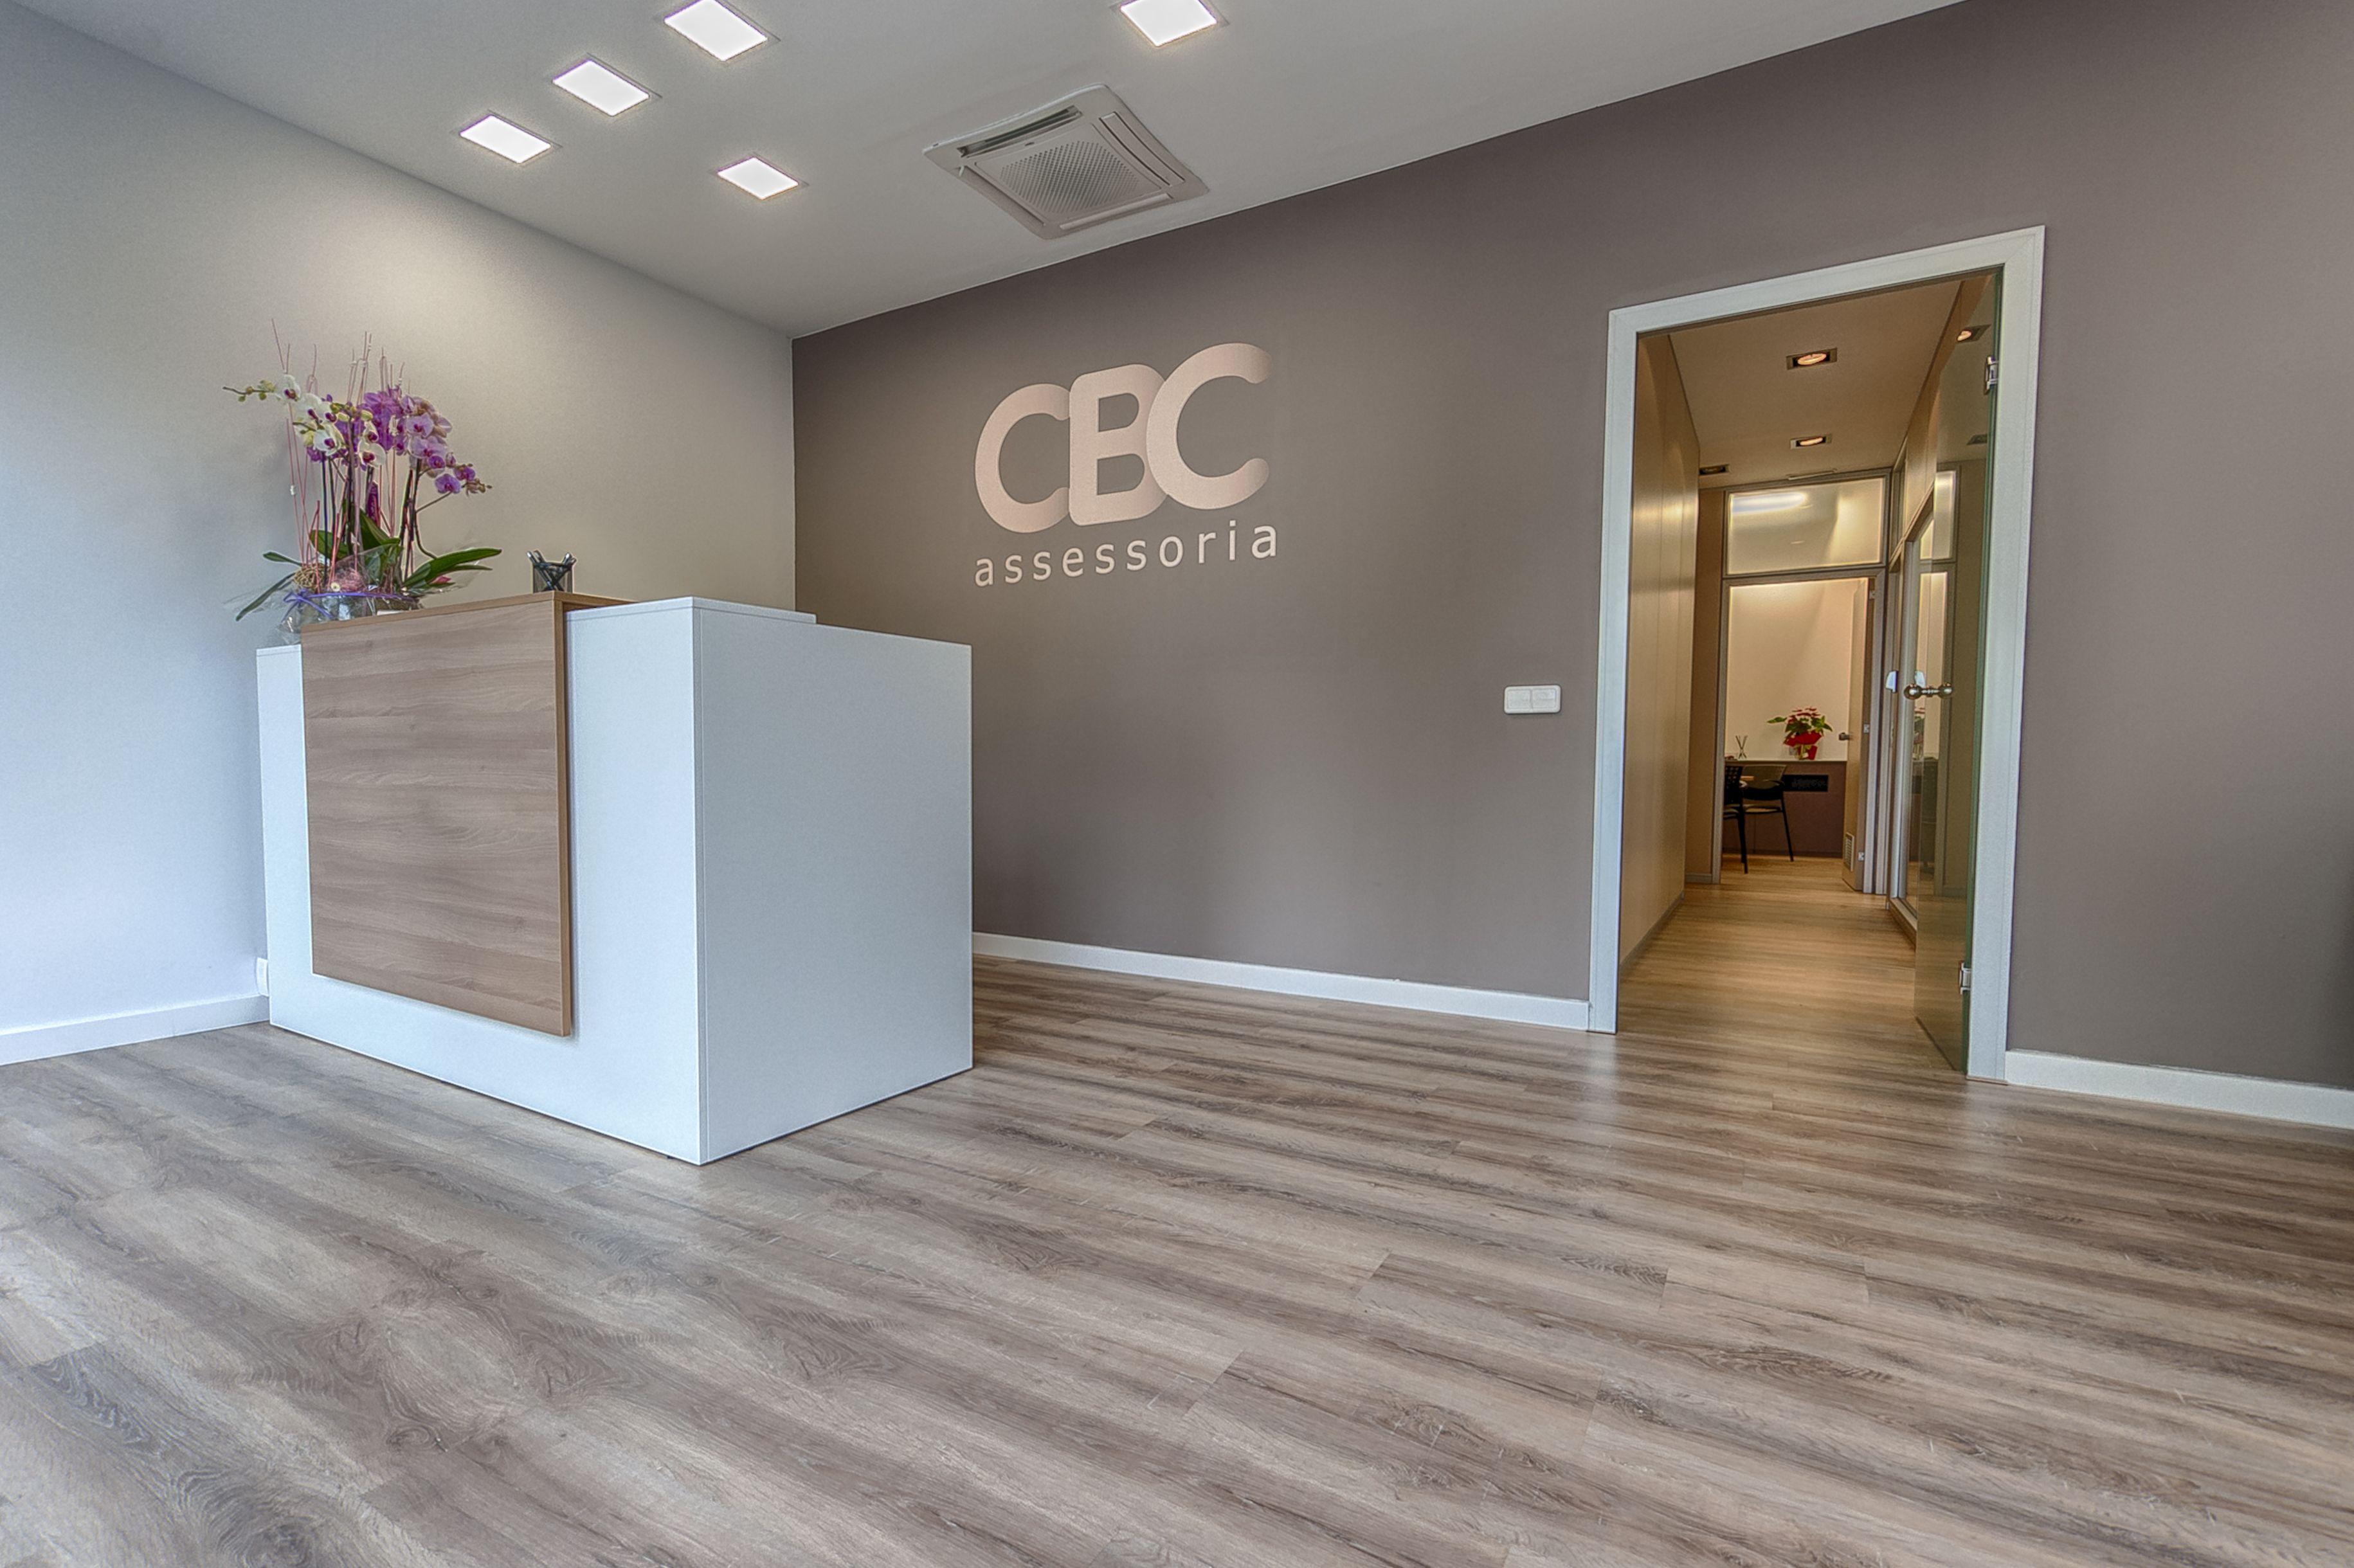 CBC acaba de renovar la seva imatge corporativa FOTO: Cedida